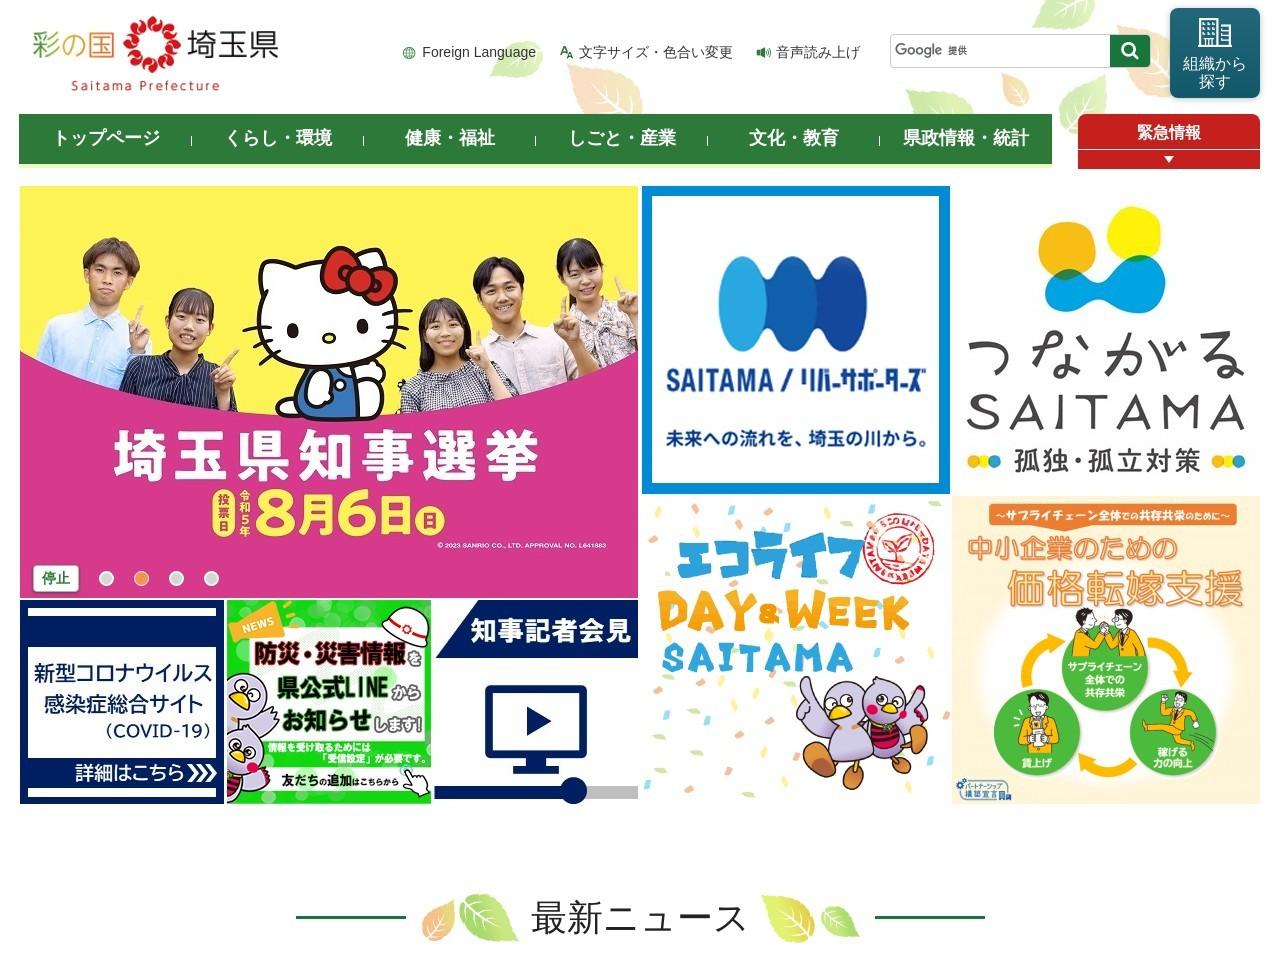 http://www.pref.saitama.lg.jp/site/ikushutop/sainokagayaki.html